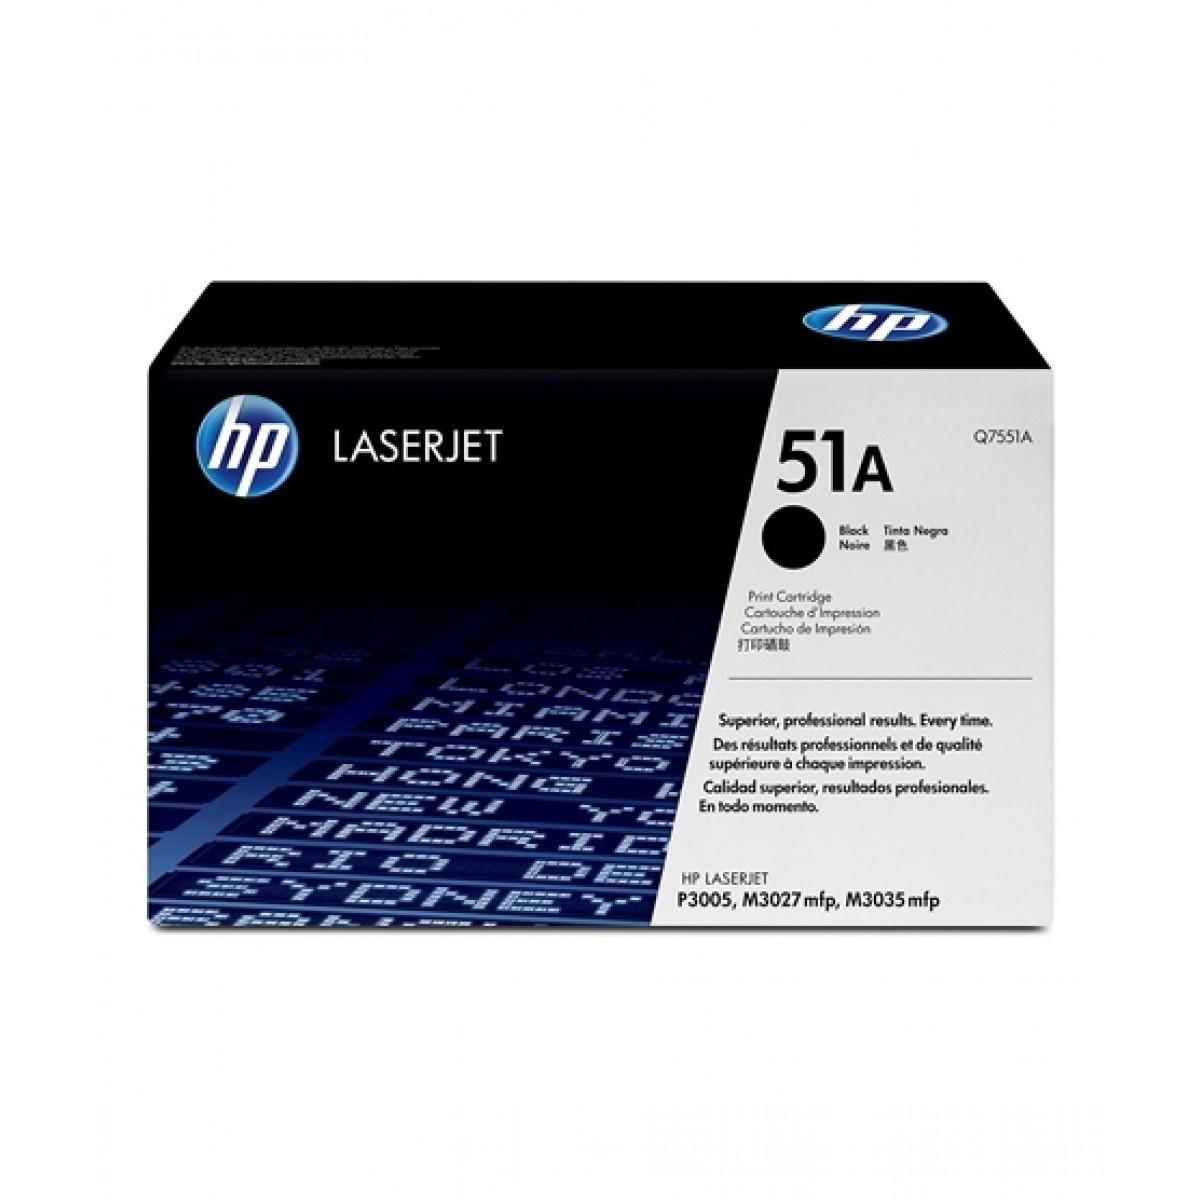 HP 51A LaserJet Toner Cartridge Black (Q7551A)